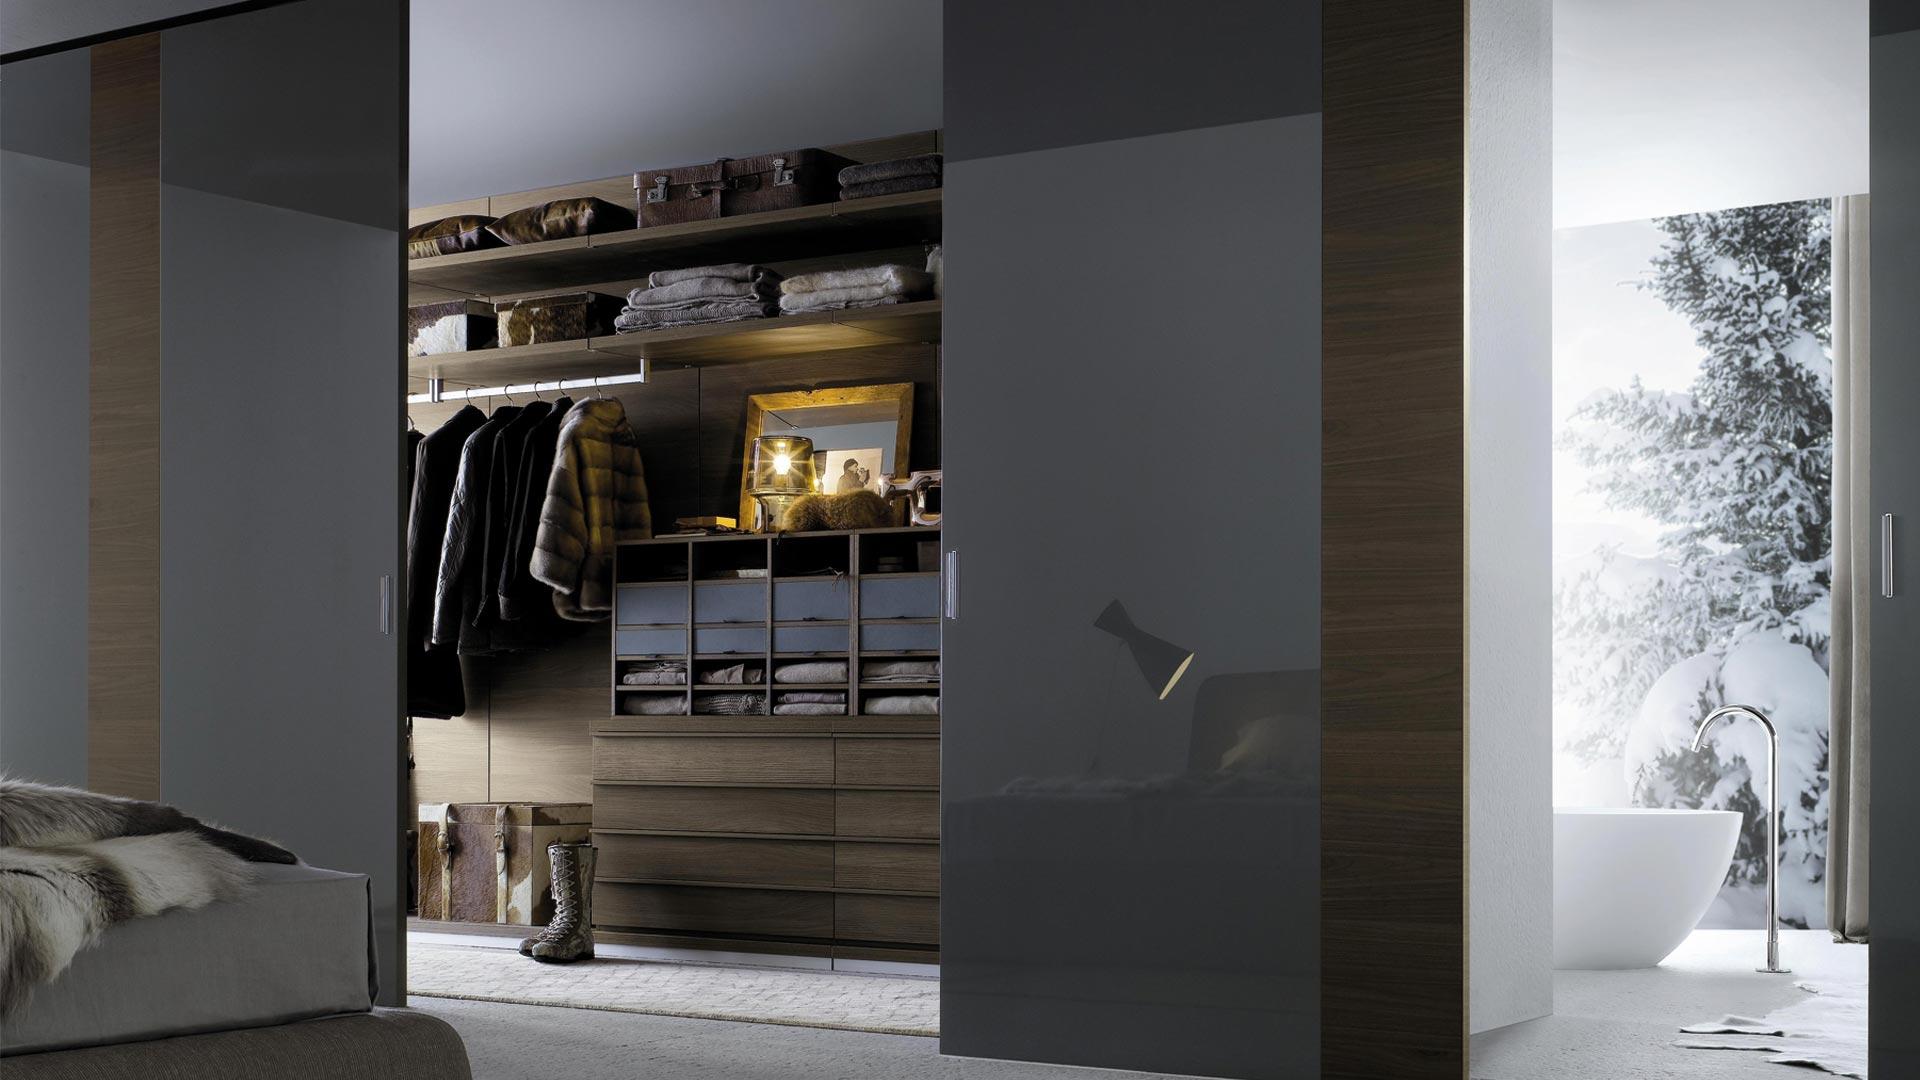 raum rolf schubiger. Black Bedroom Furniture Sets. Home Design Ideas